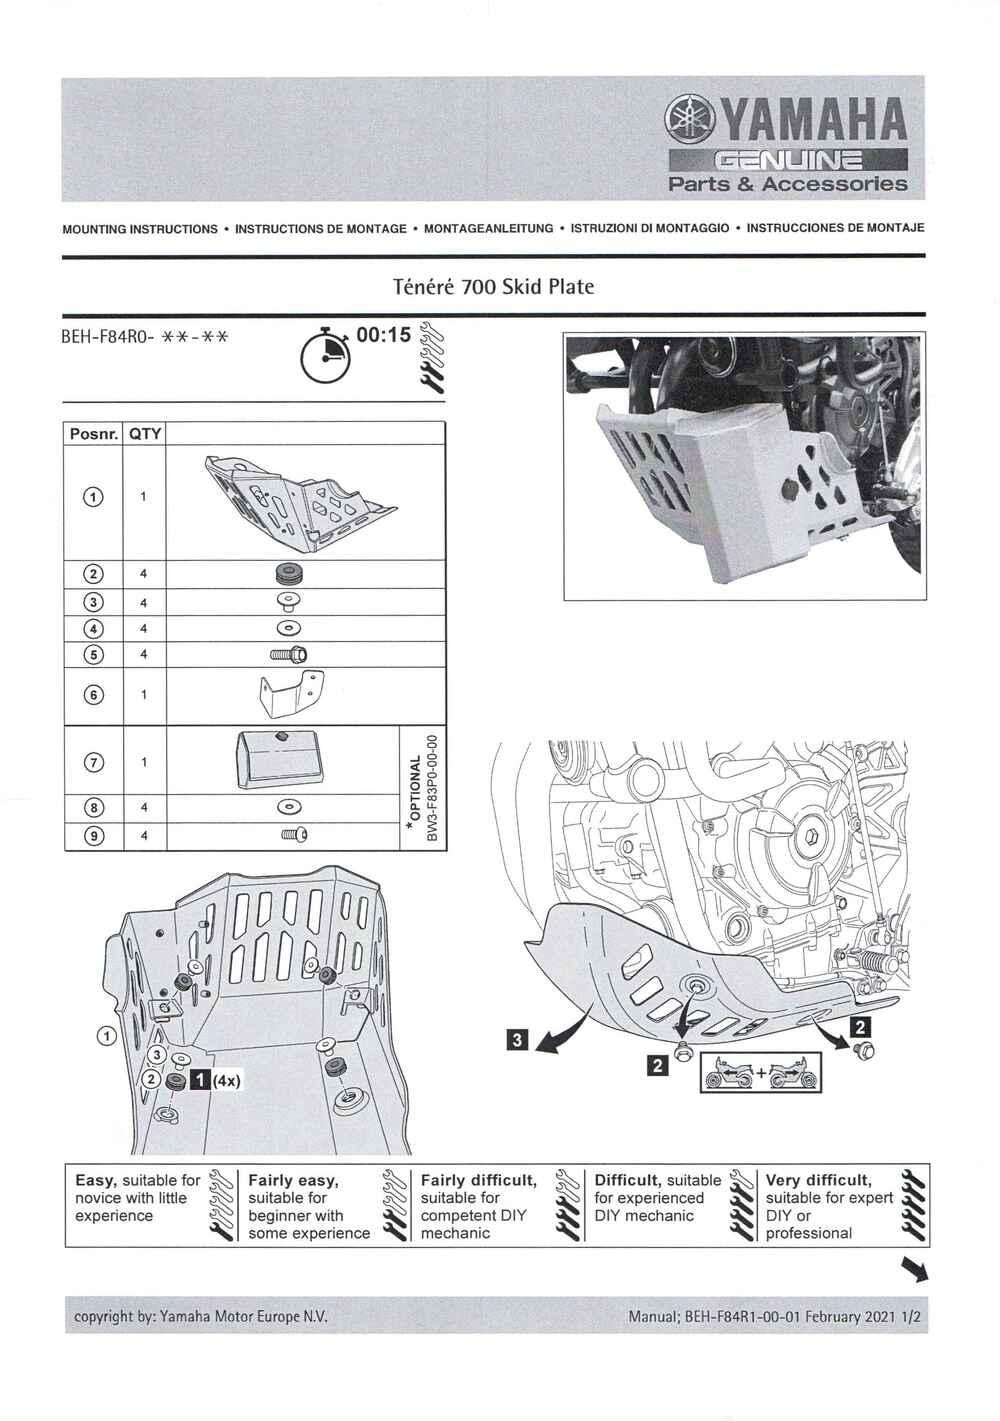 Montageanleitung Motorschutz Tenere 700 ab Euro 5